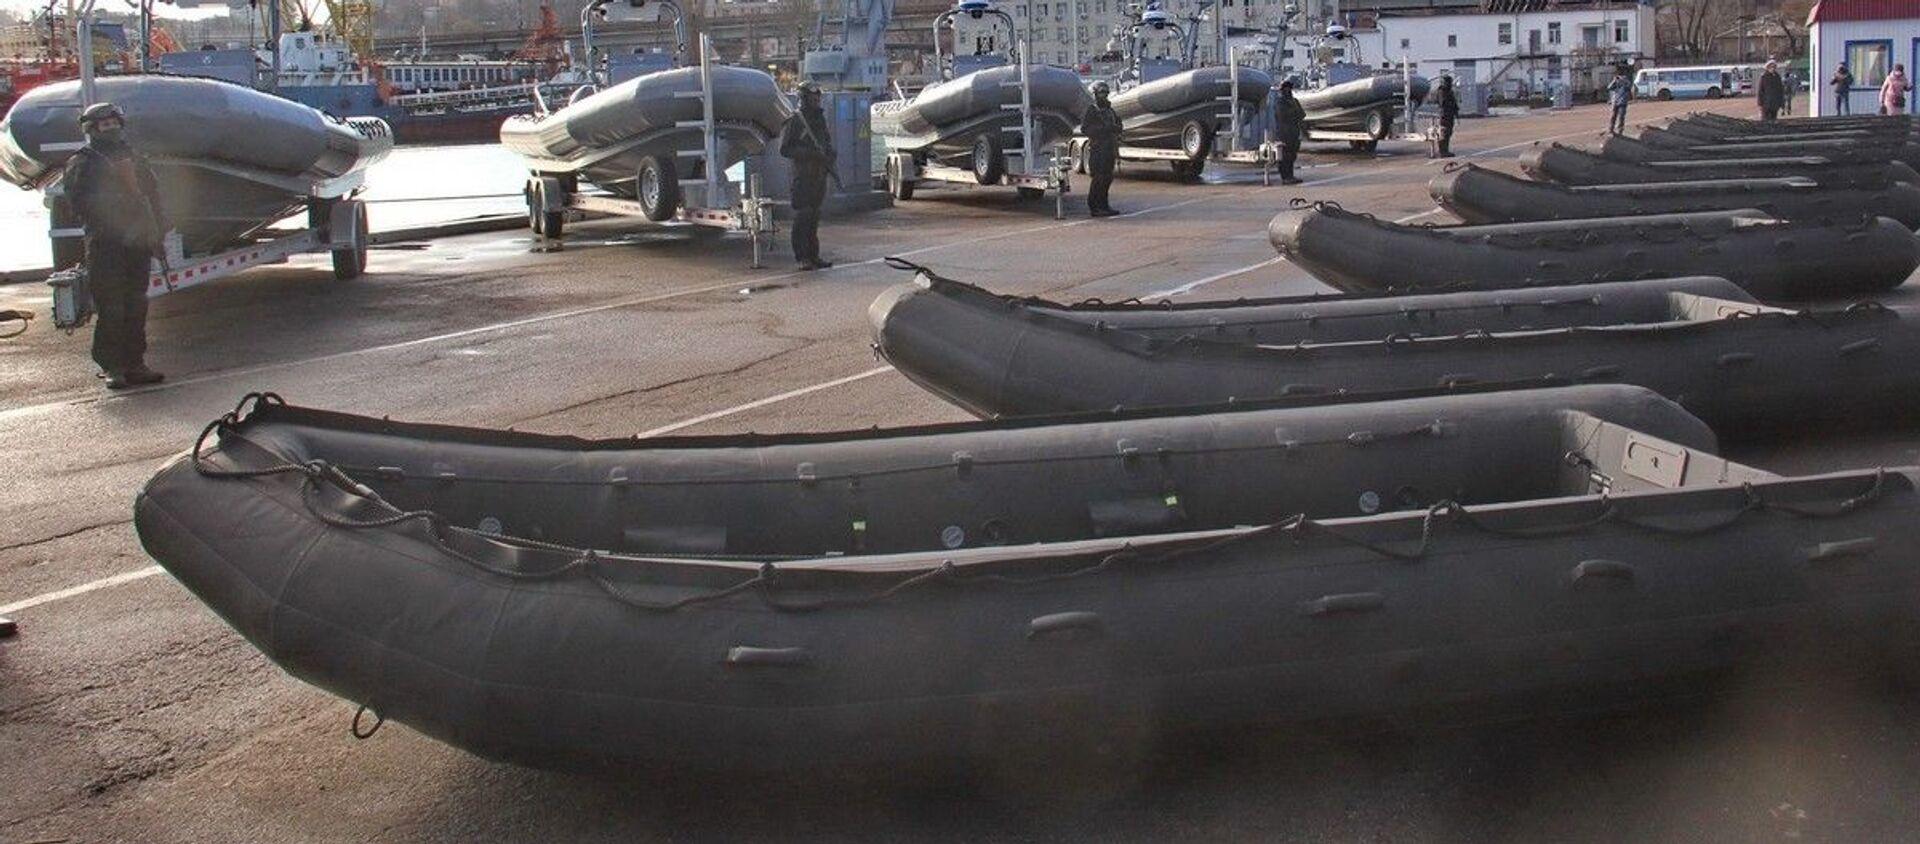 Thuyền bơm hơi do Hoa Kỳ tặng cho Hải quân Ukraine. - Sputnik Việt Nam, 1920, 12.02.2021